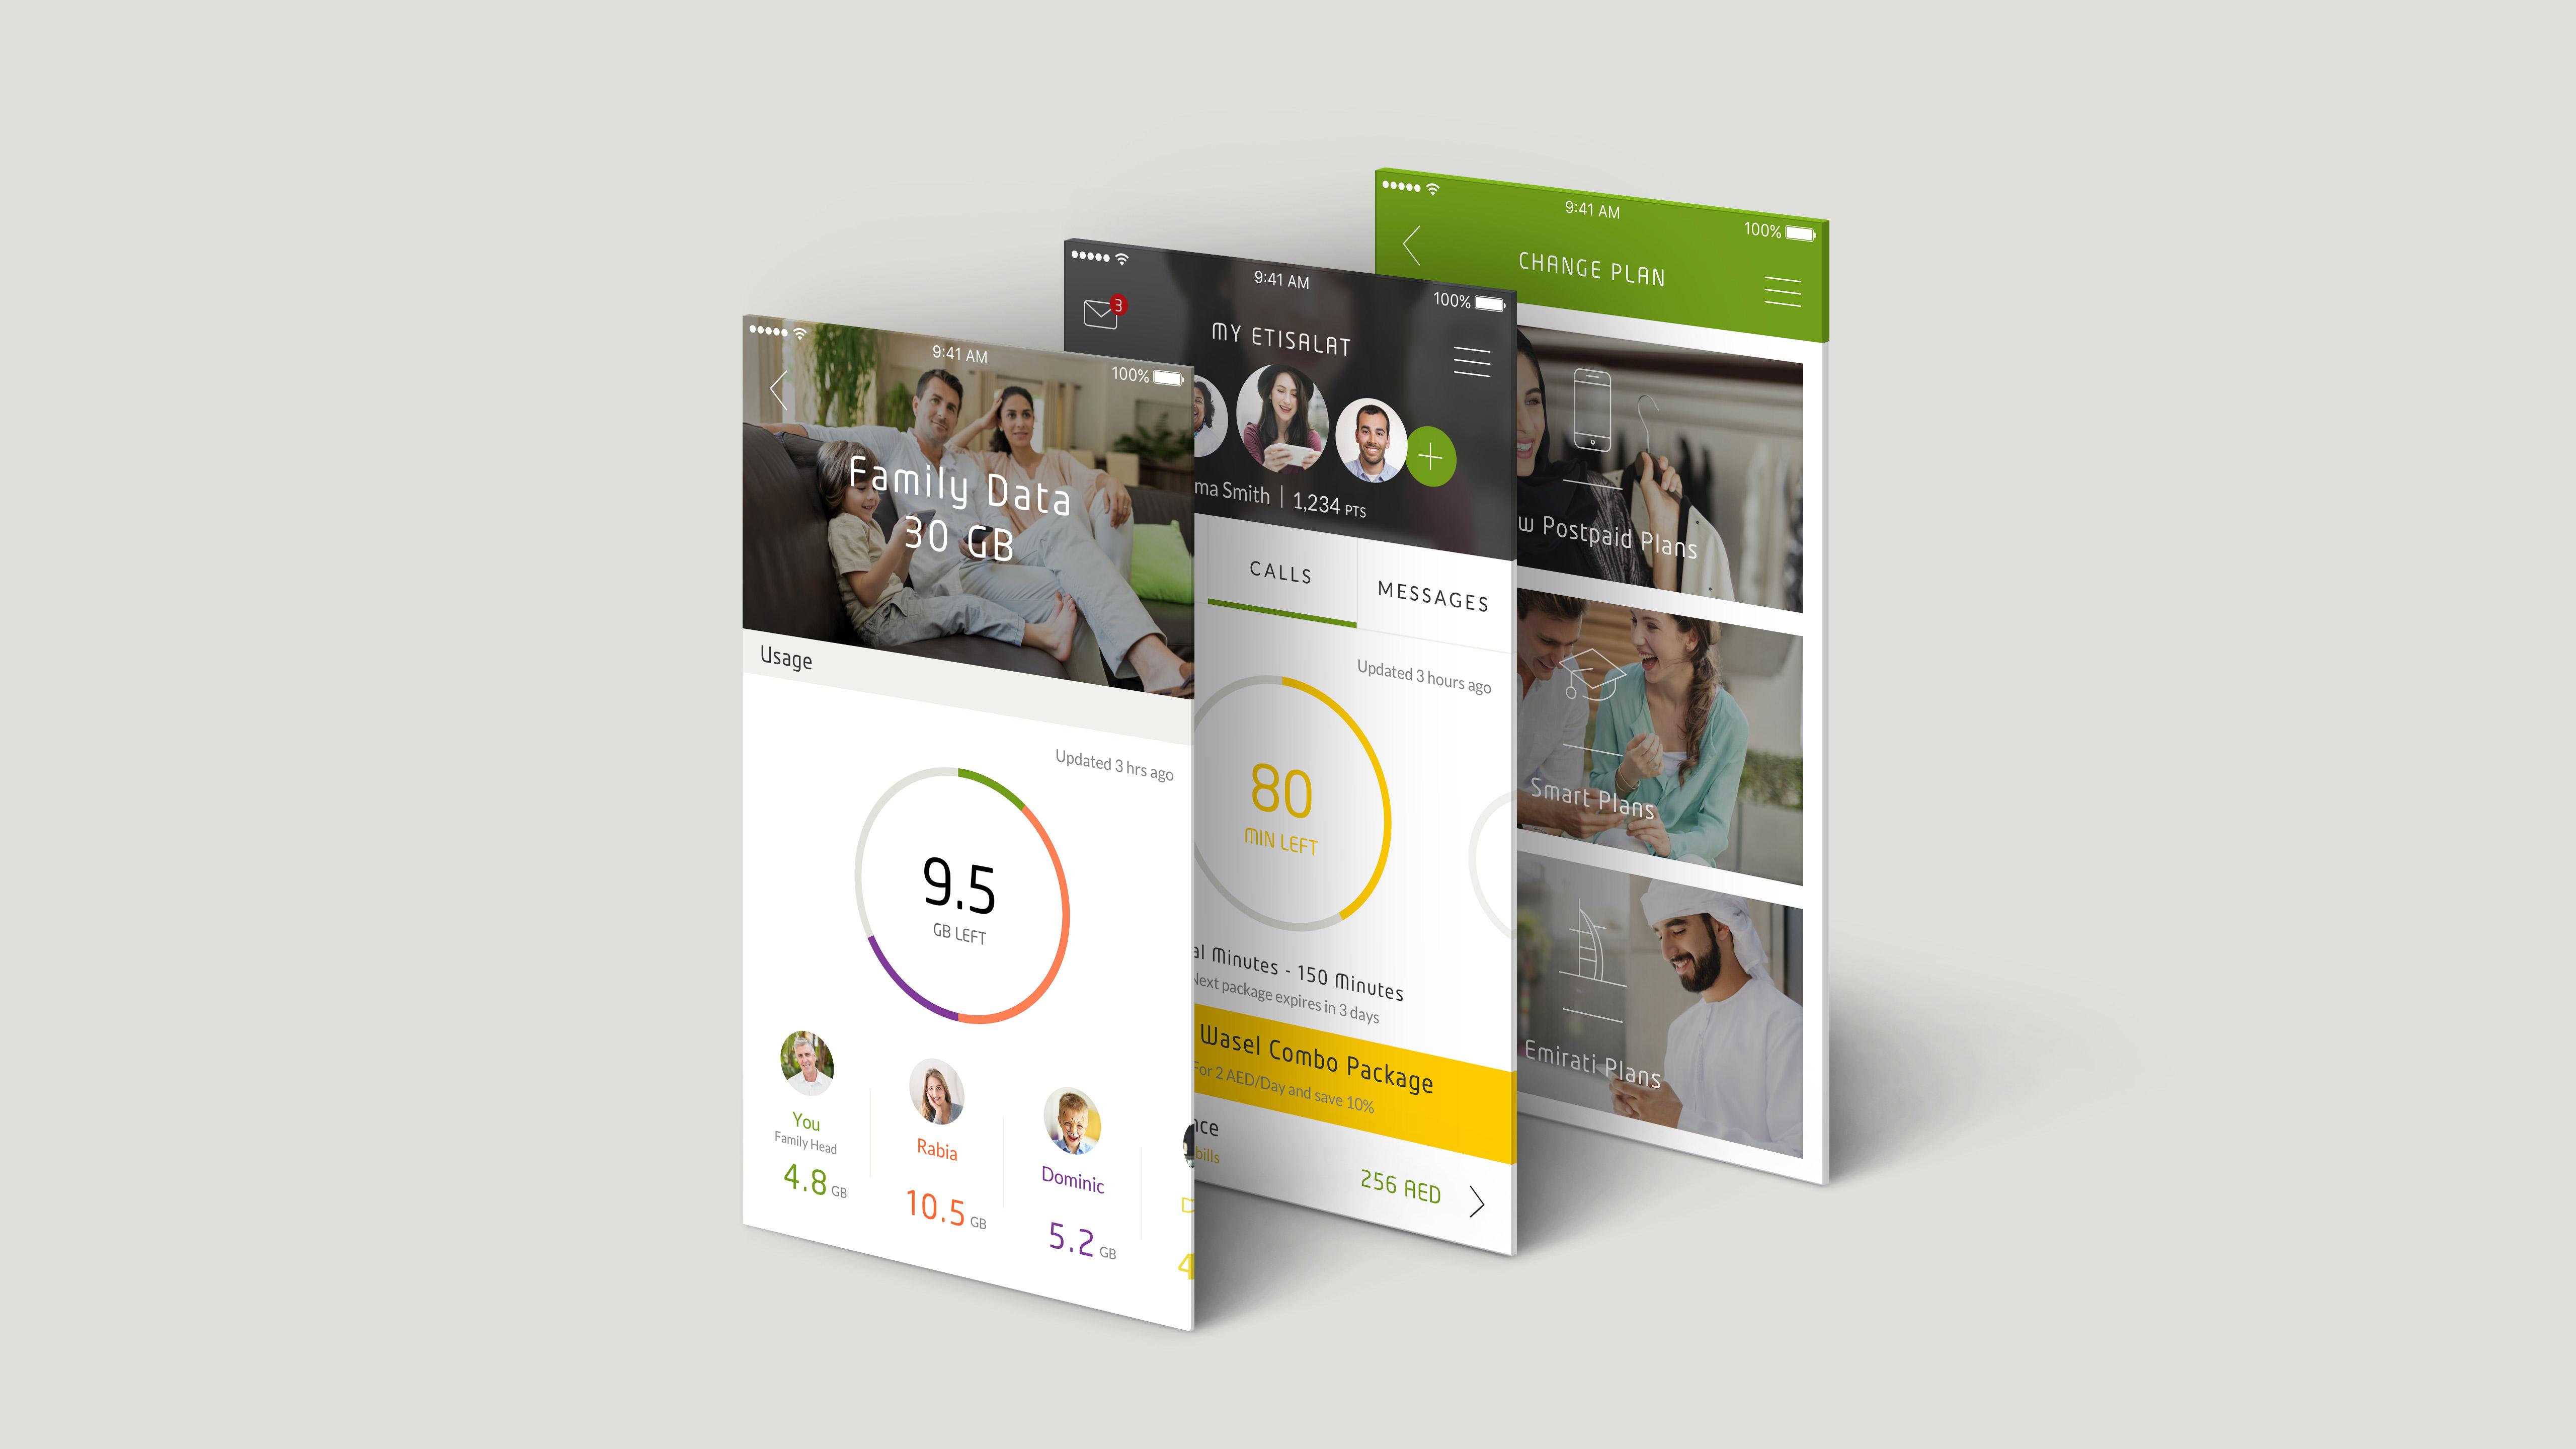 etisalat_design_system_032